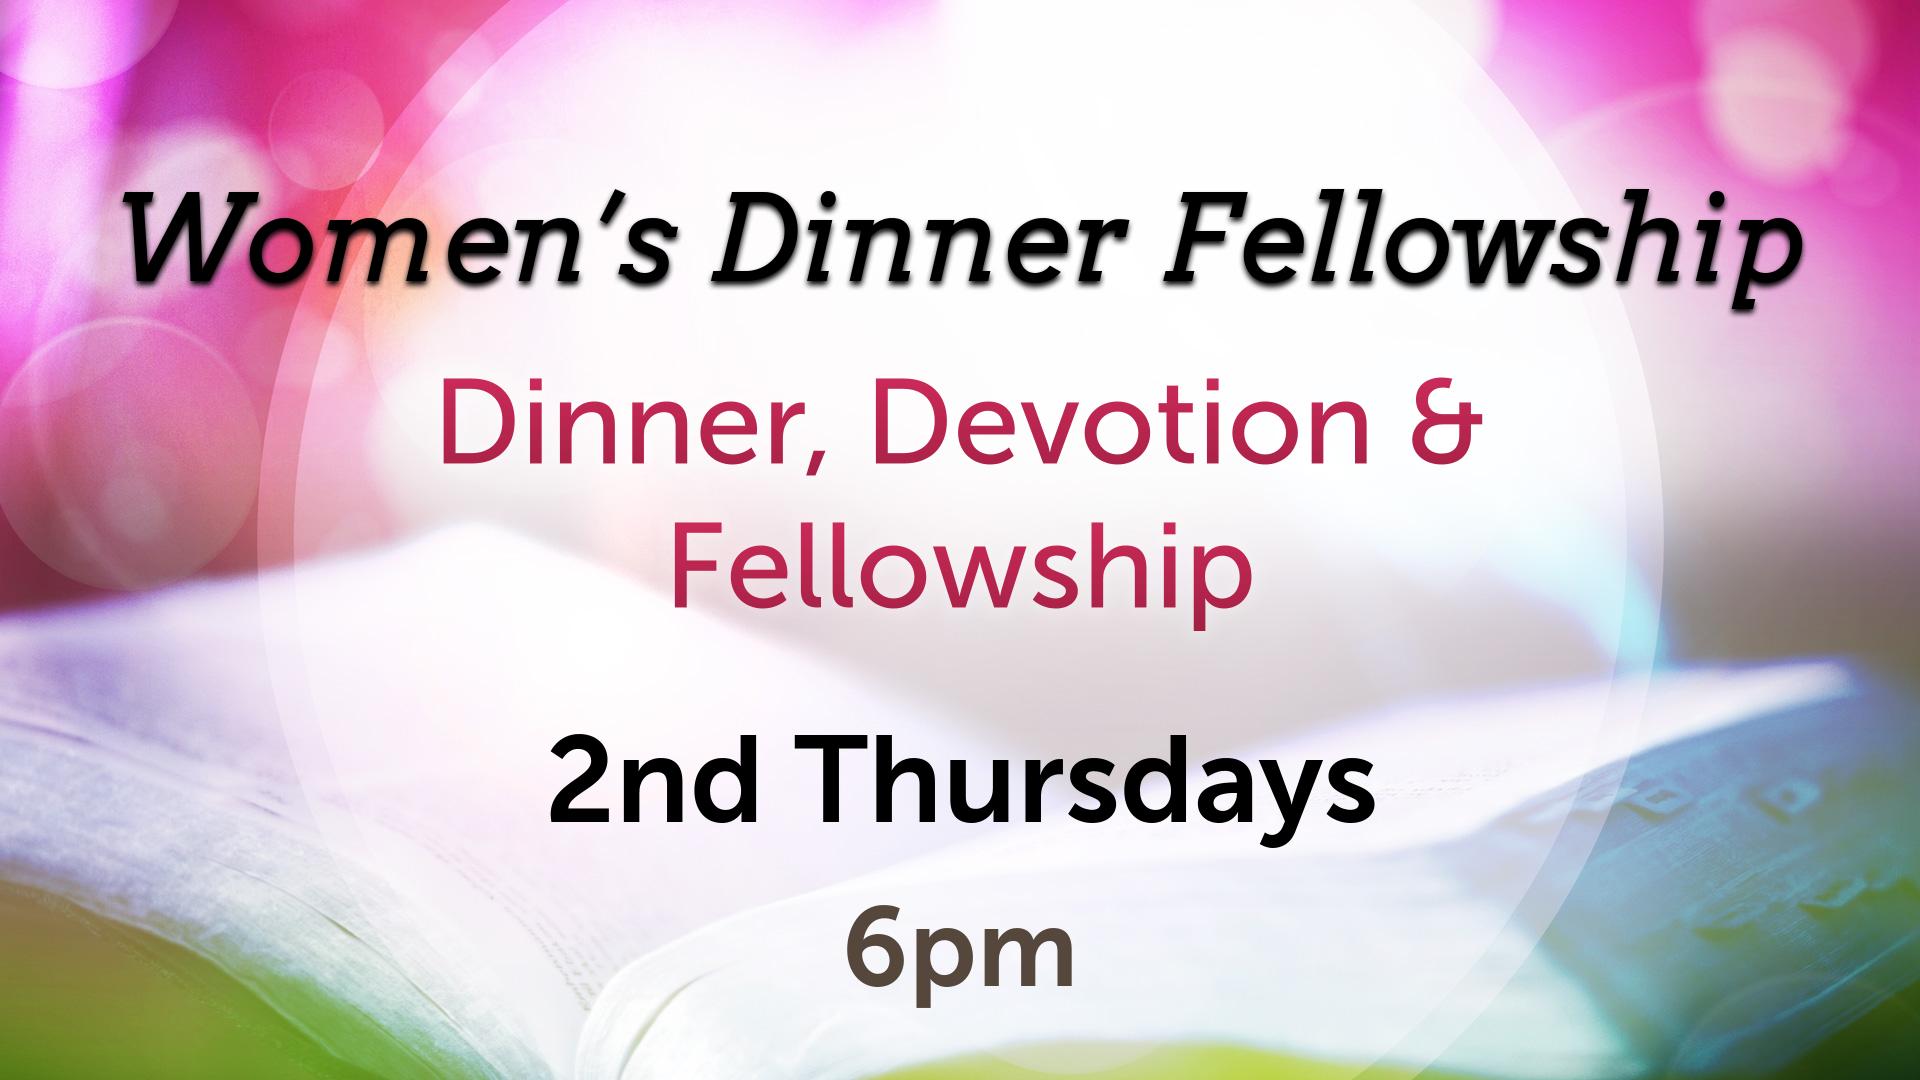 Women's Dinner Fellowship